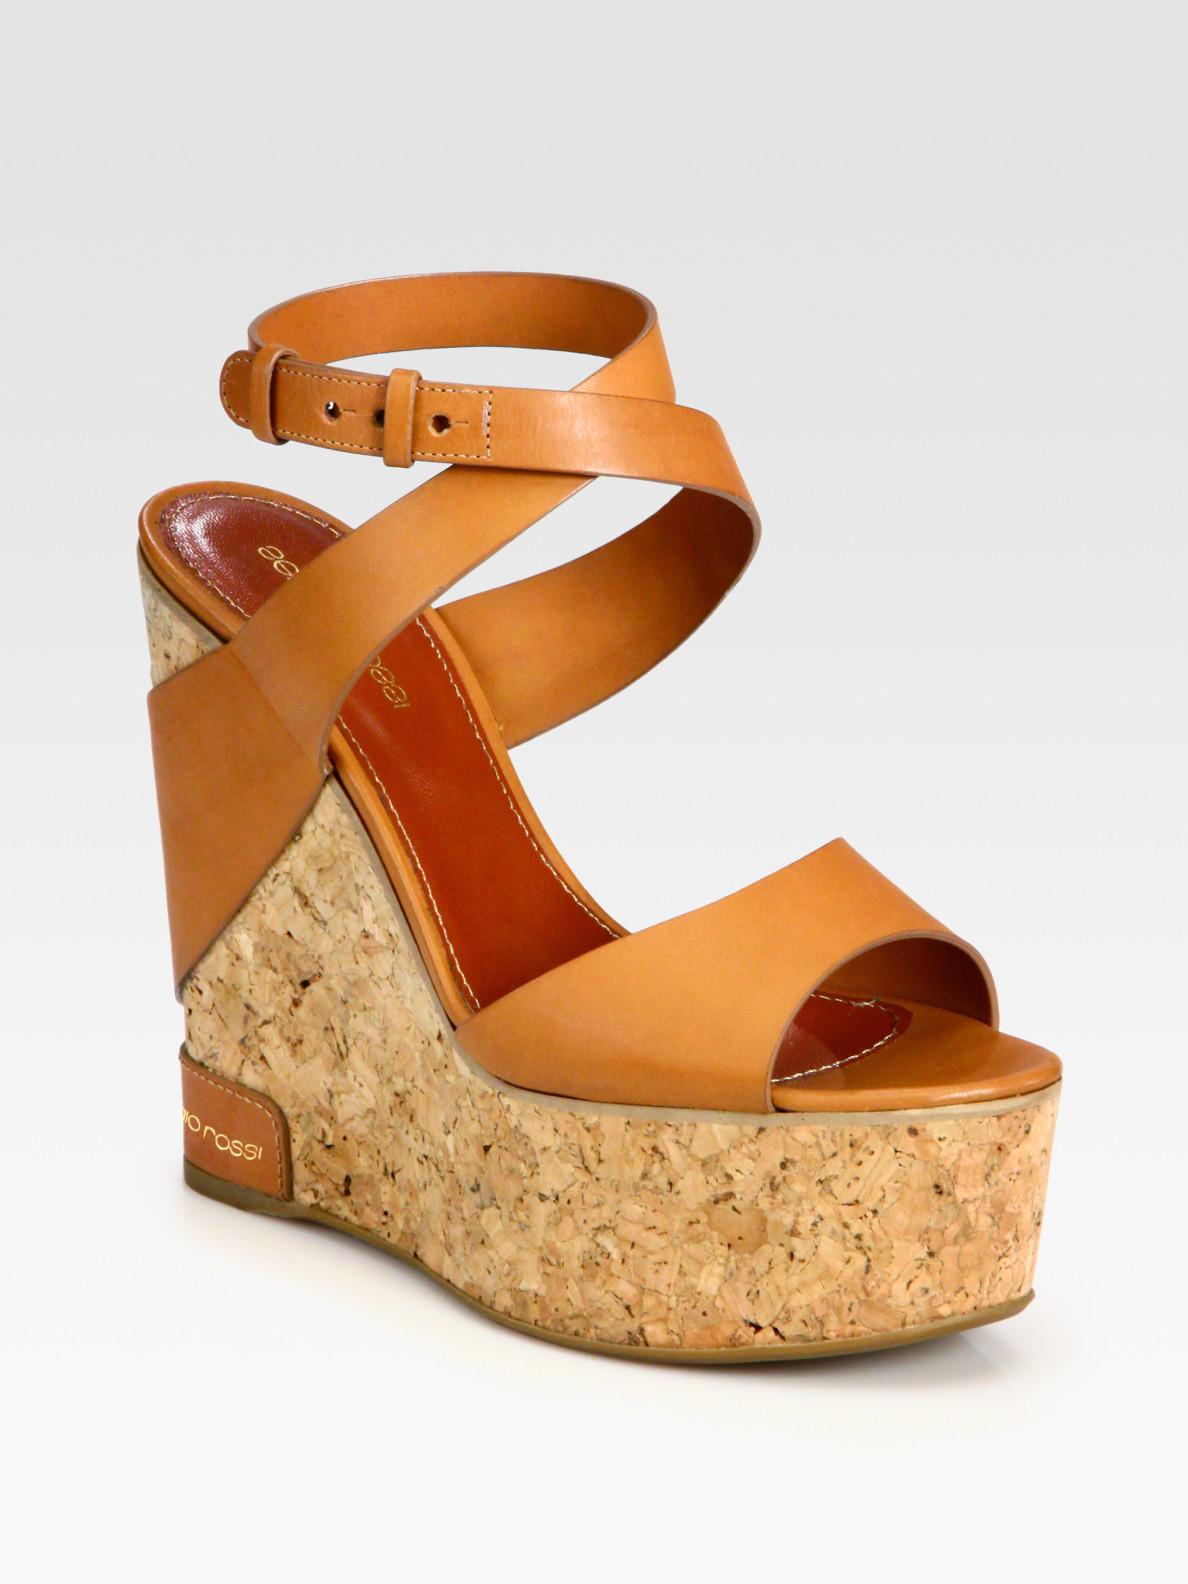 Sergio Rossi Leather Cork Wedge Platform Sandals In Brown